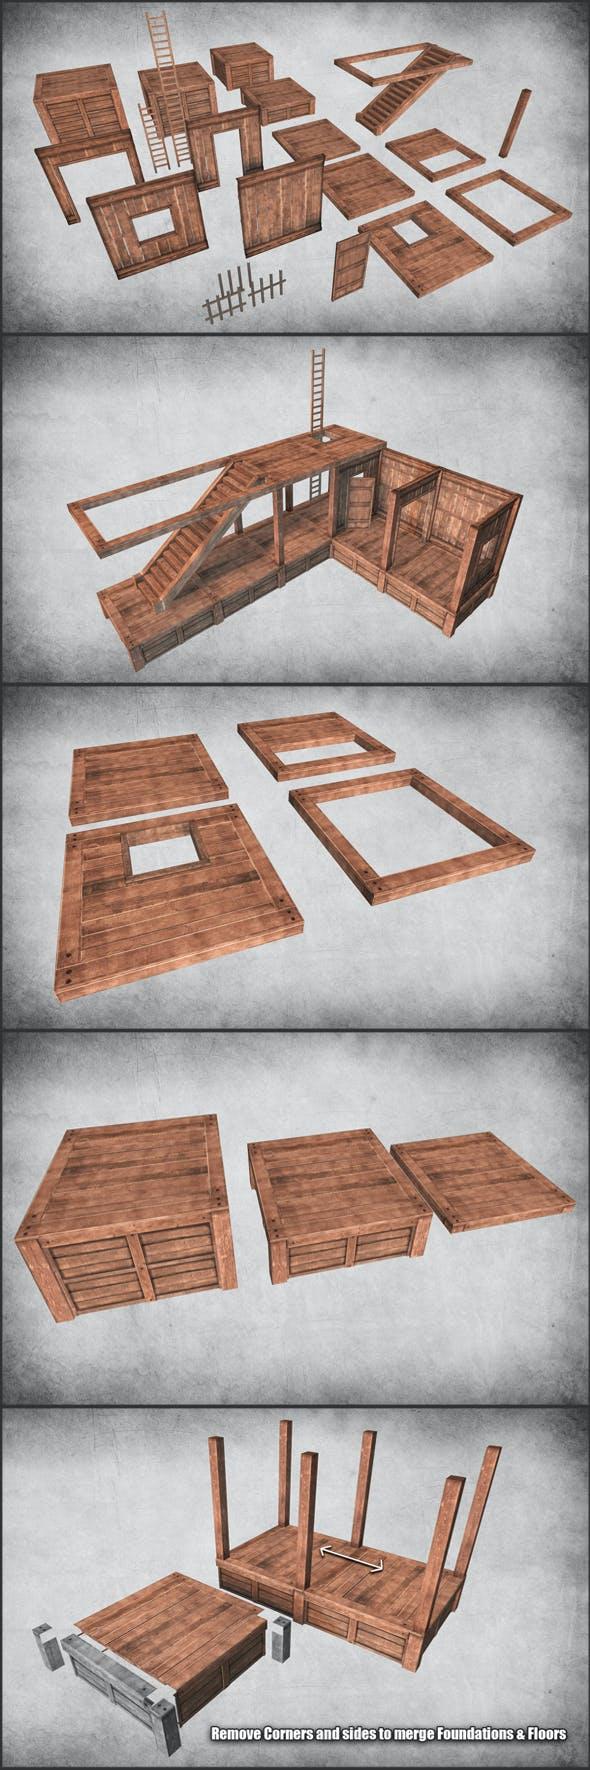 Survival Wood Crafting Kit - 3DOcean Item for Sale